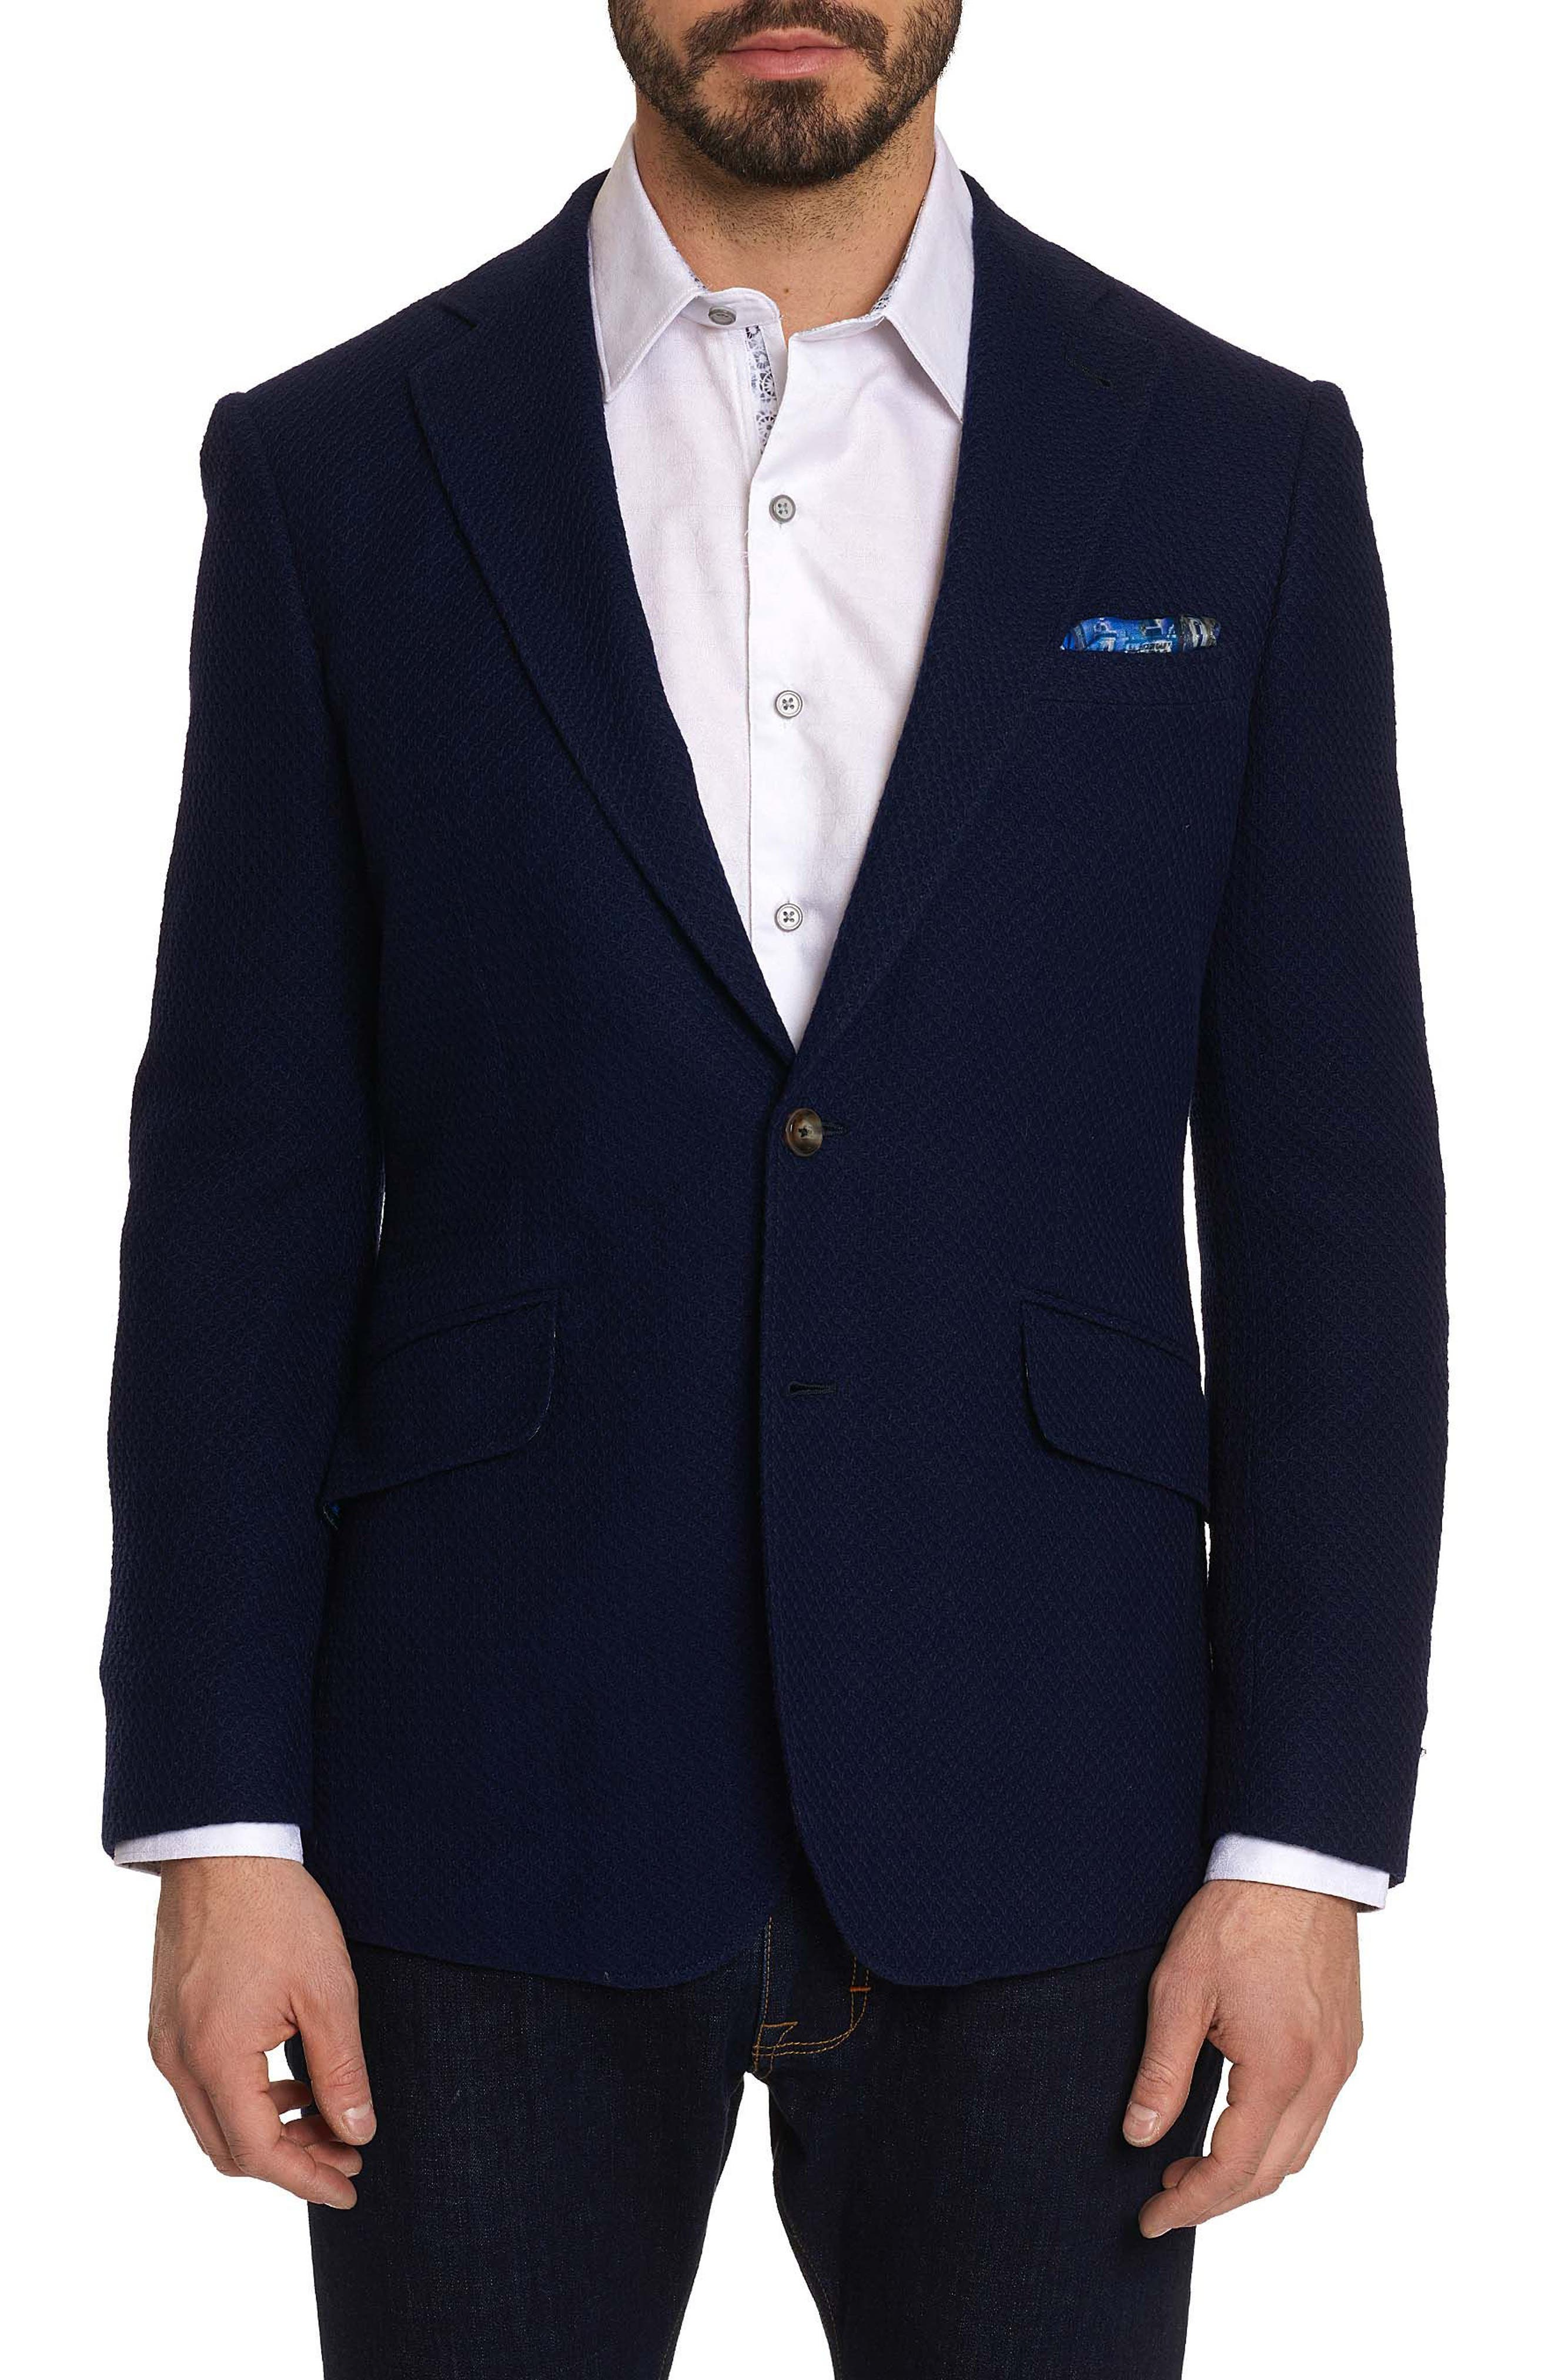 Lauros Woven Sport Coat,                             Main thumbnail 1, color,                             Navy